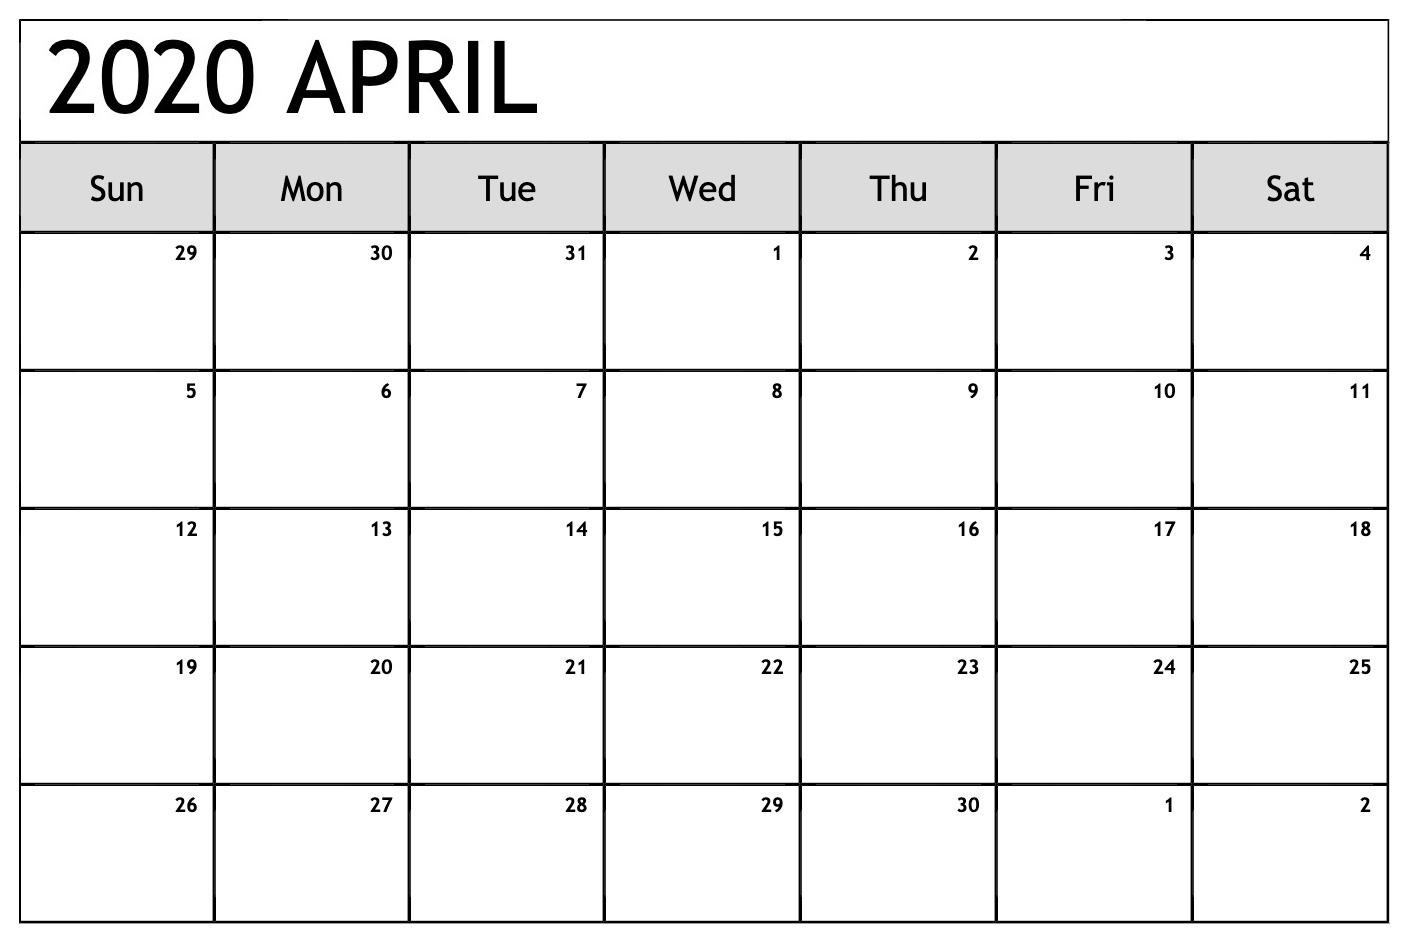 April 2020 Calendar Excel Sheet | Free Printable Calendar